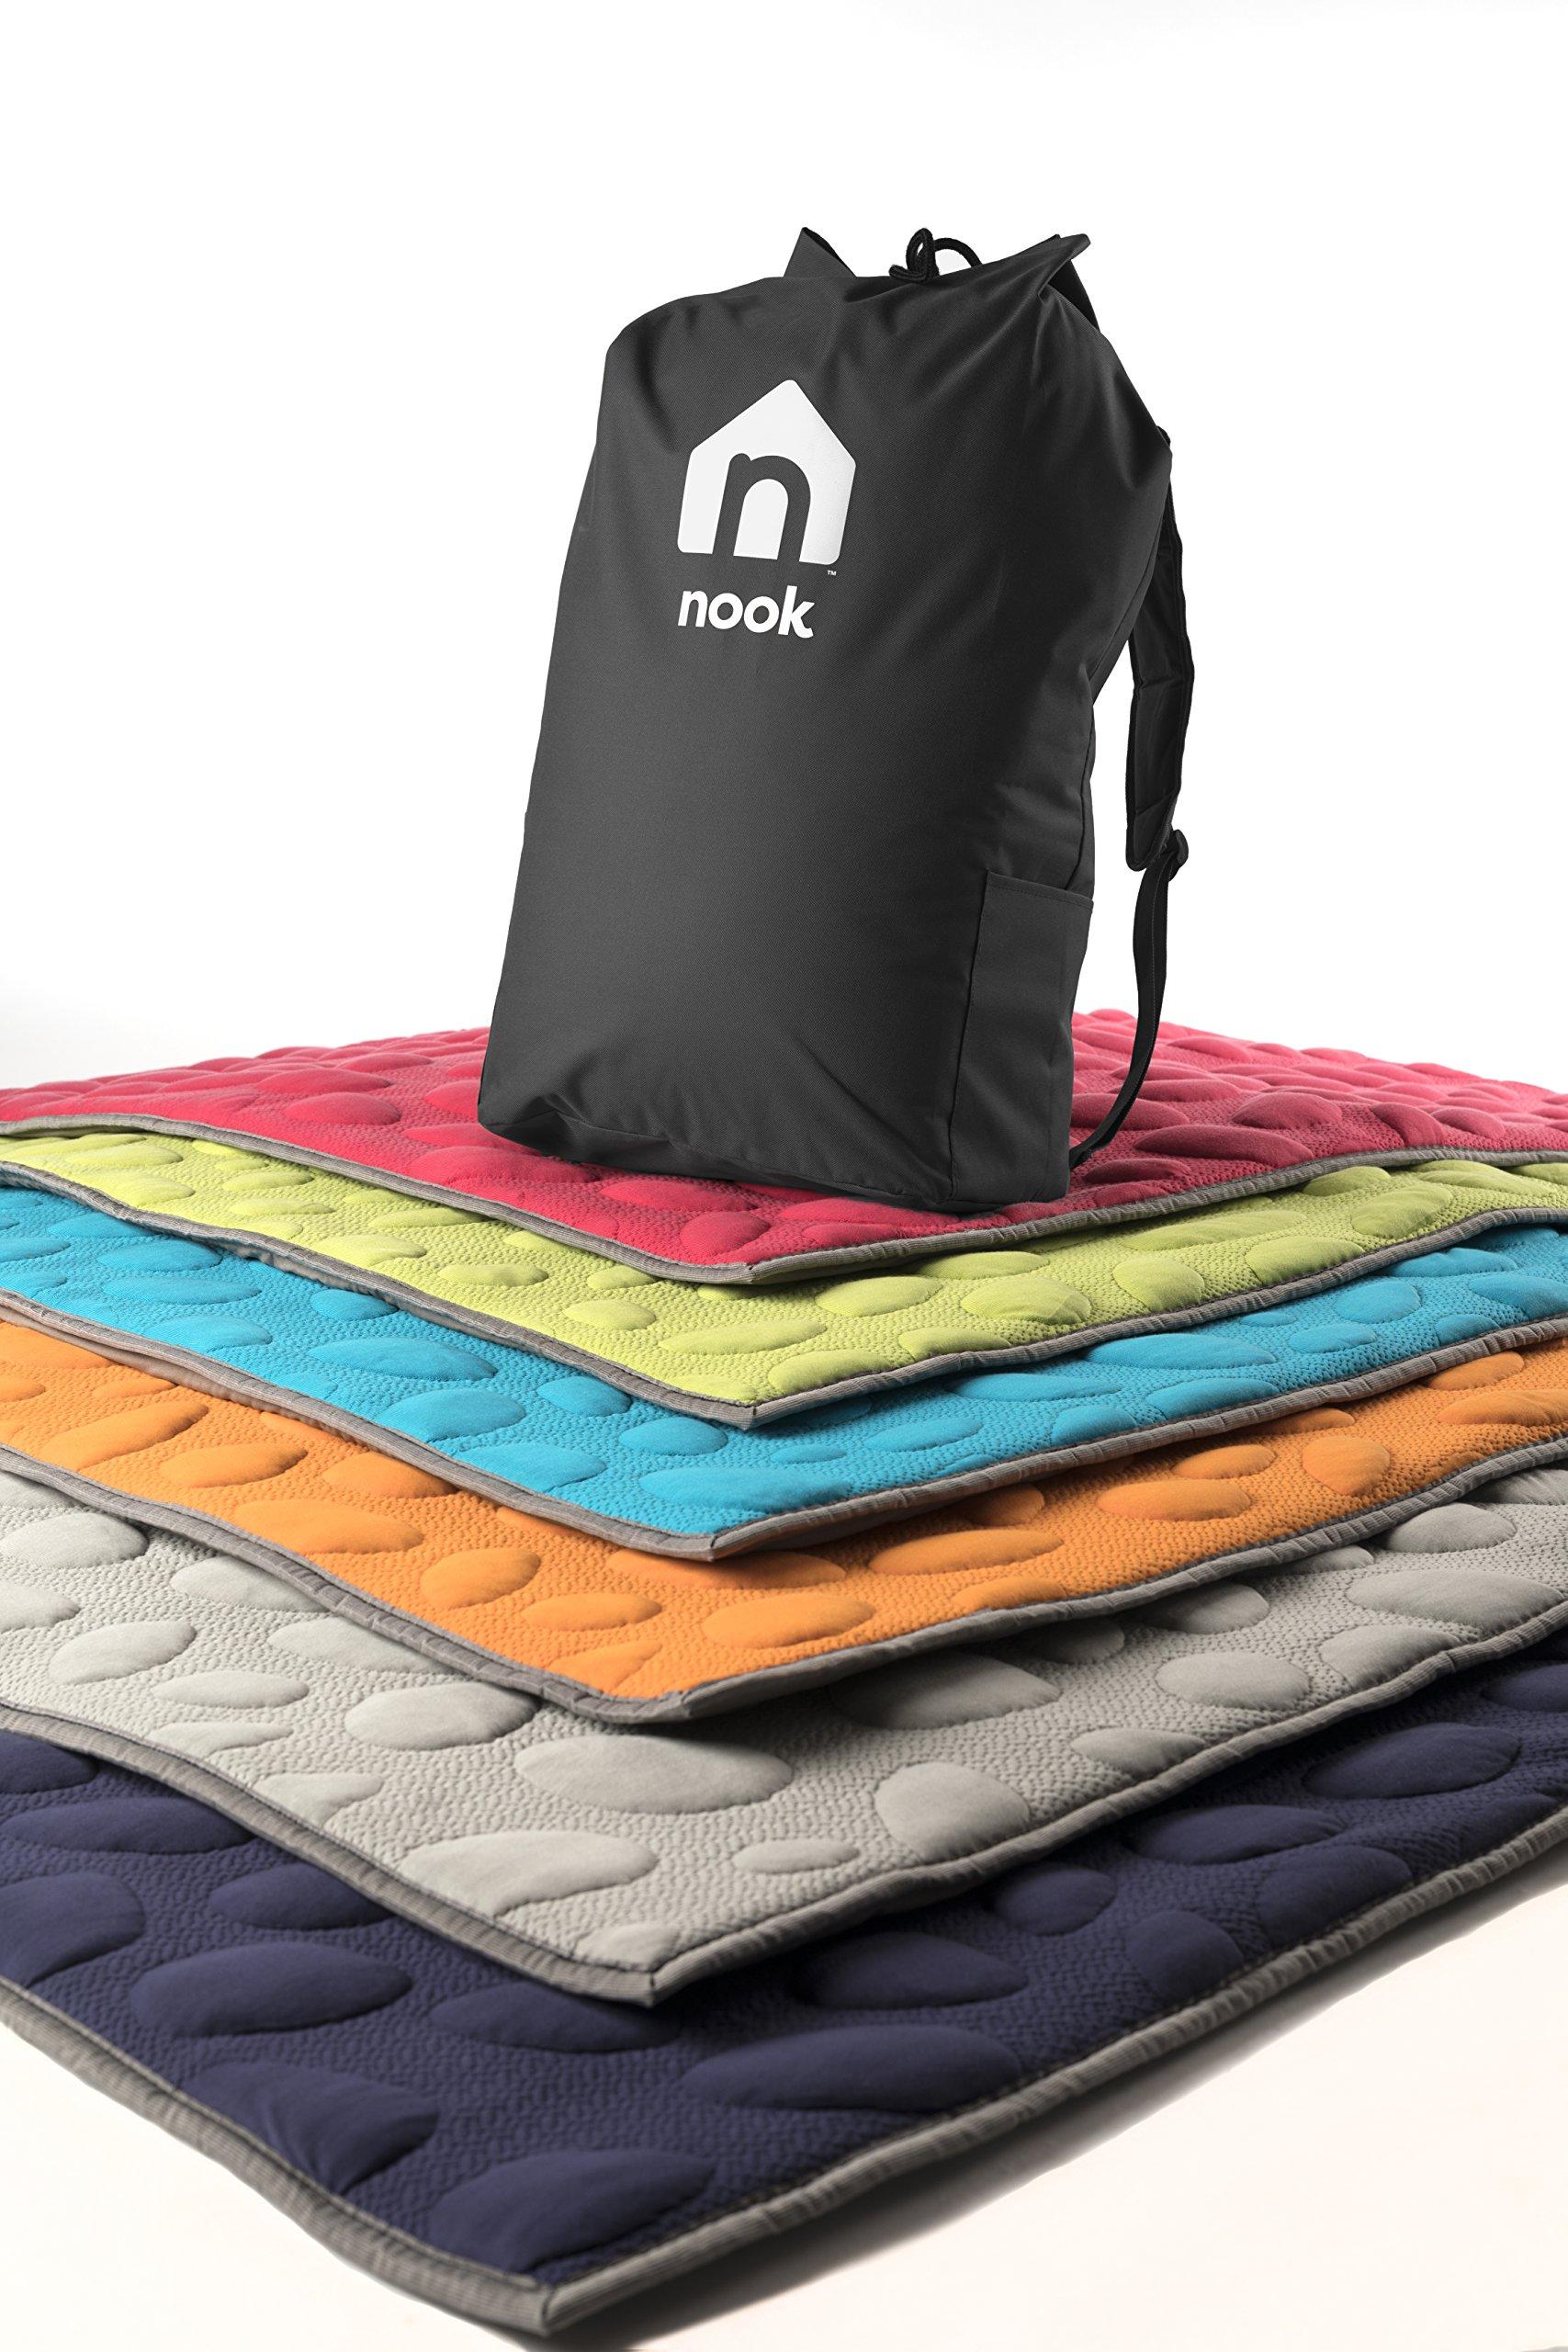 Nook Sleep LilyPad Playmat, Pacific by Nook Sleep (Image #5)